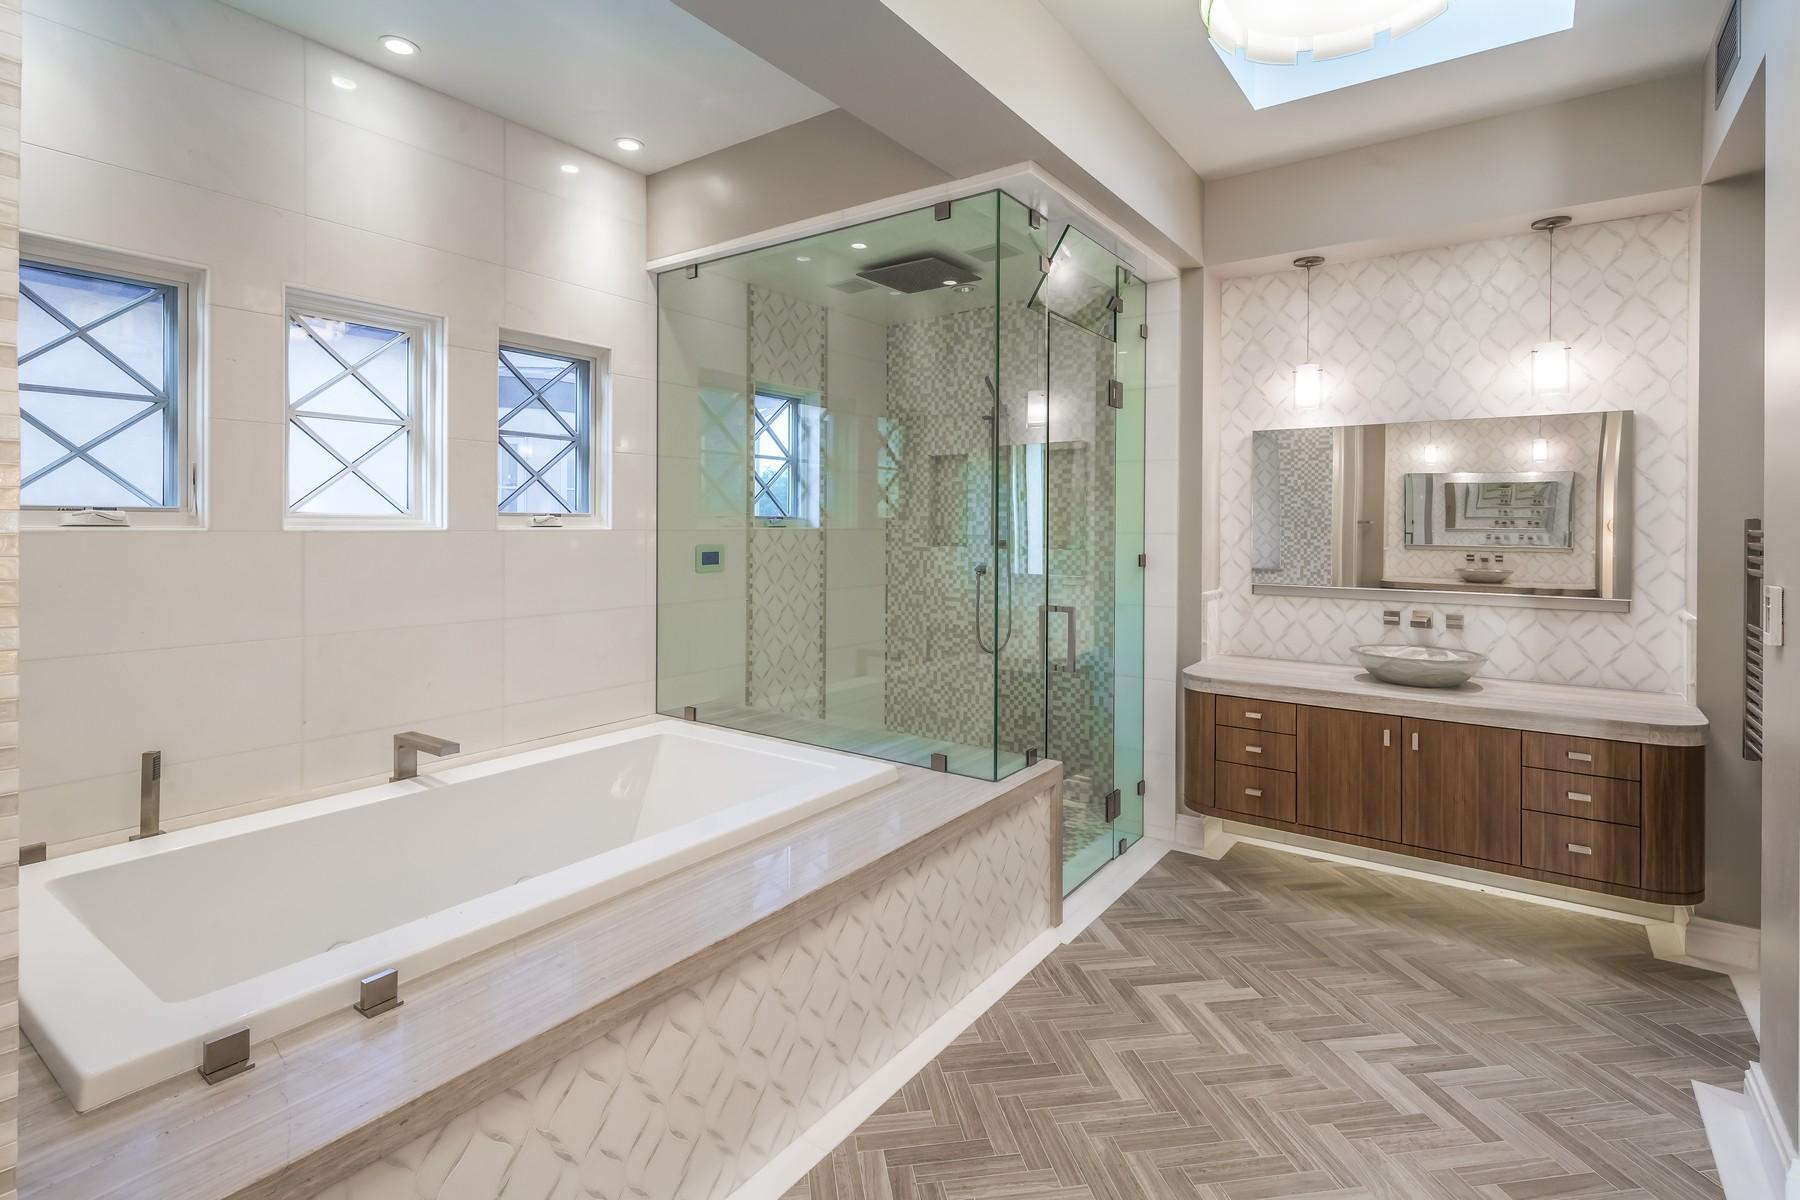 Additional photo for property listing at 824 Neptune Avenue  Encinitas, California 92024 Estados Unidos